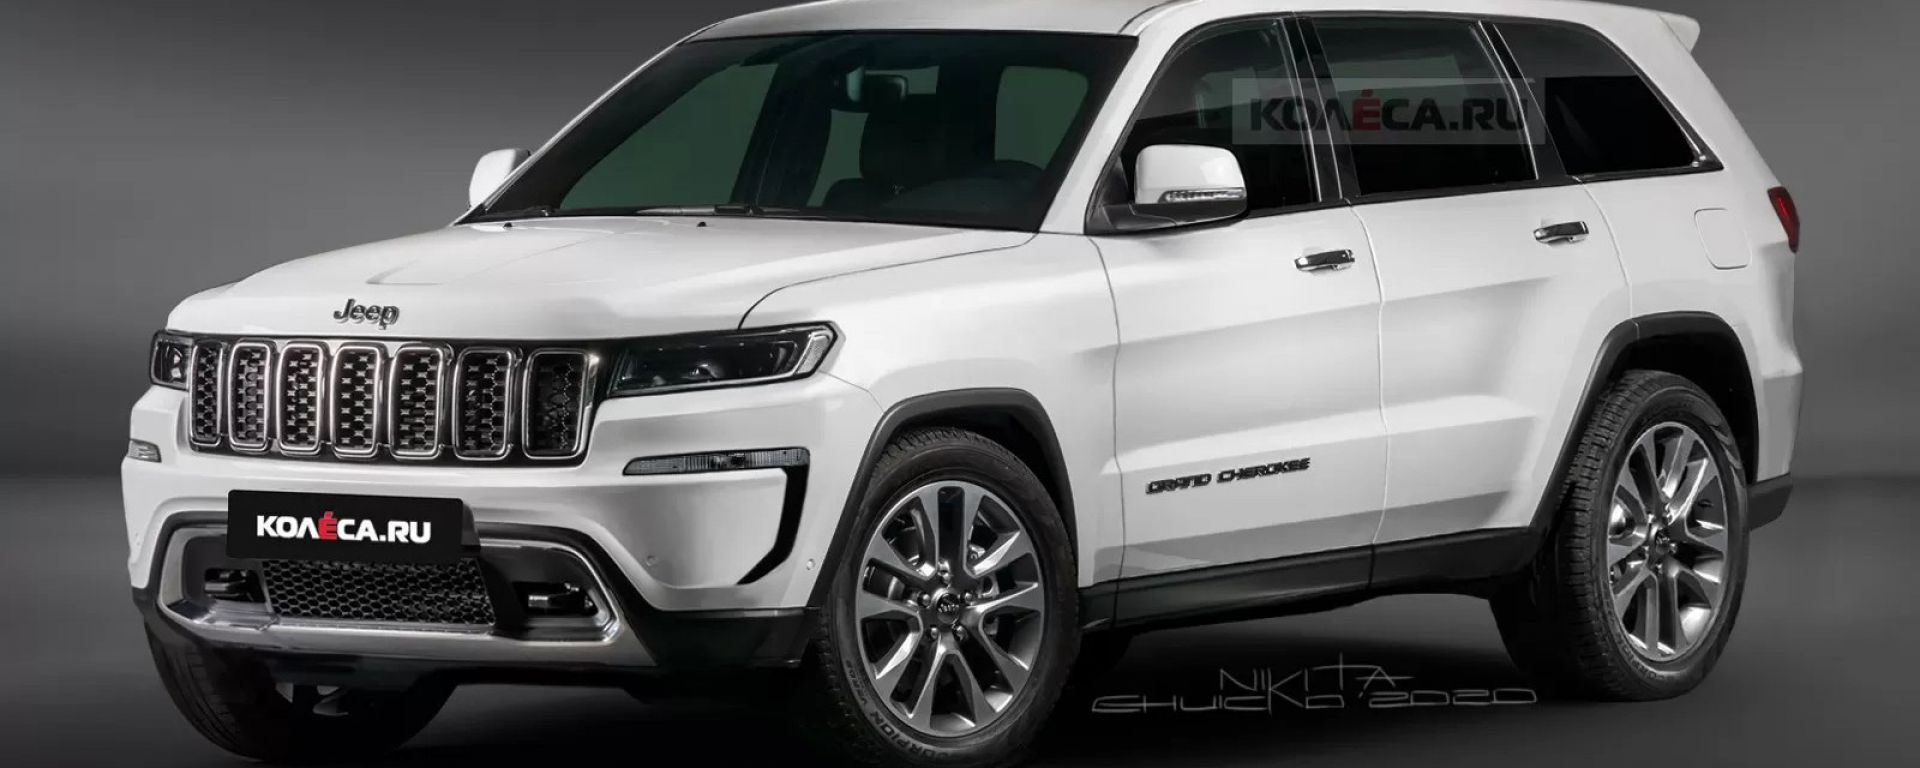 Nuova Jeep Grand Cherokee, il render di Nikita Chuiko